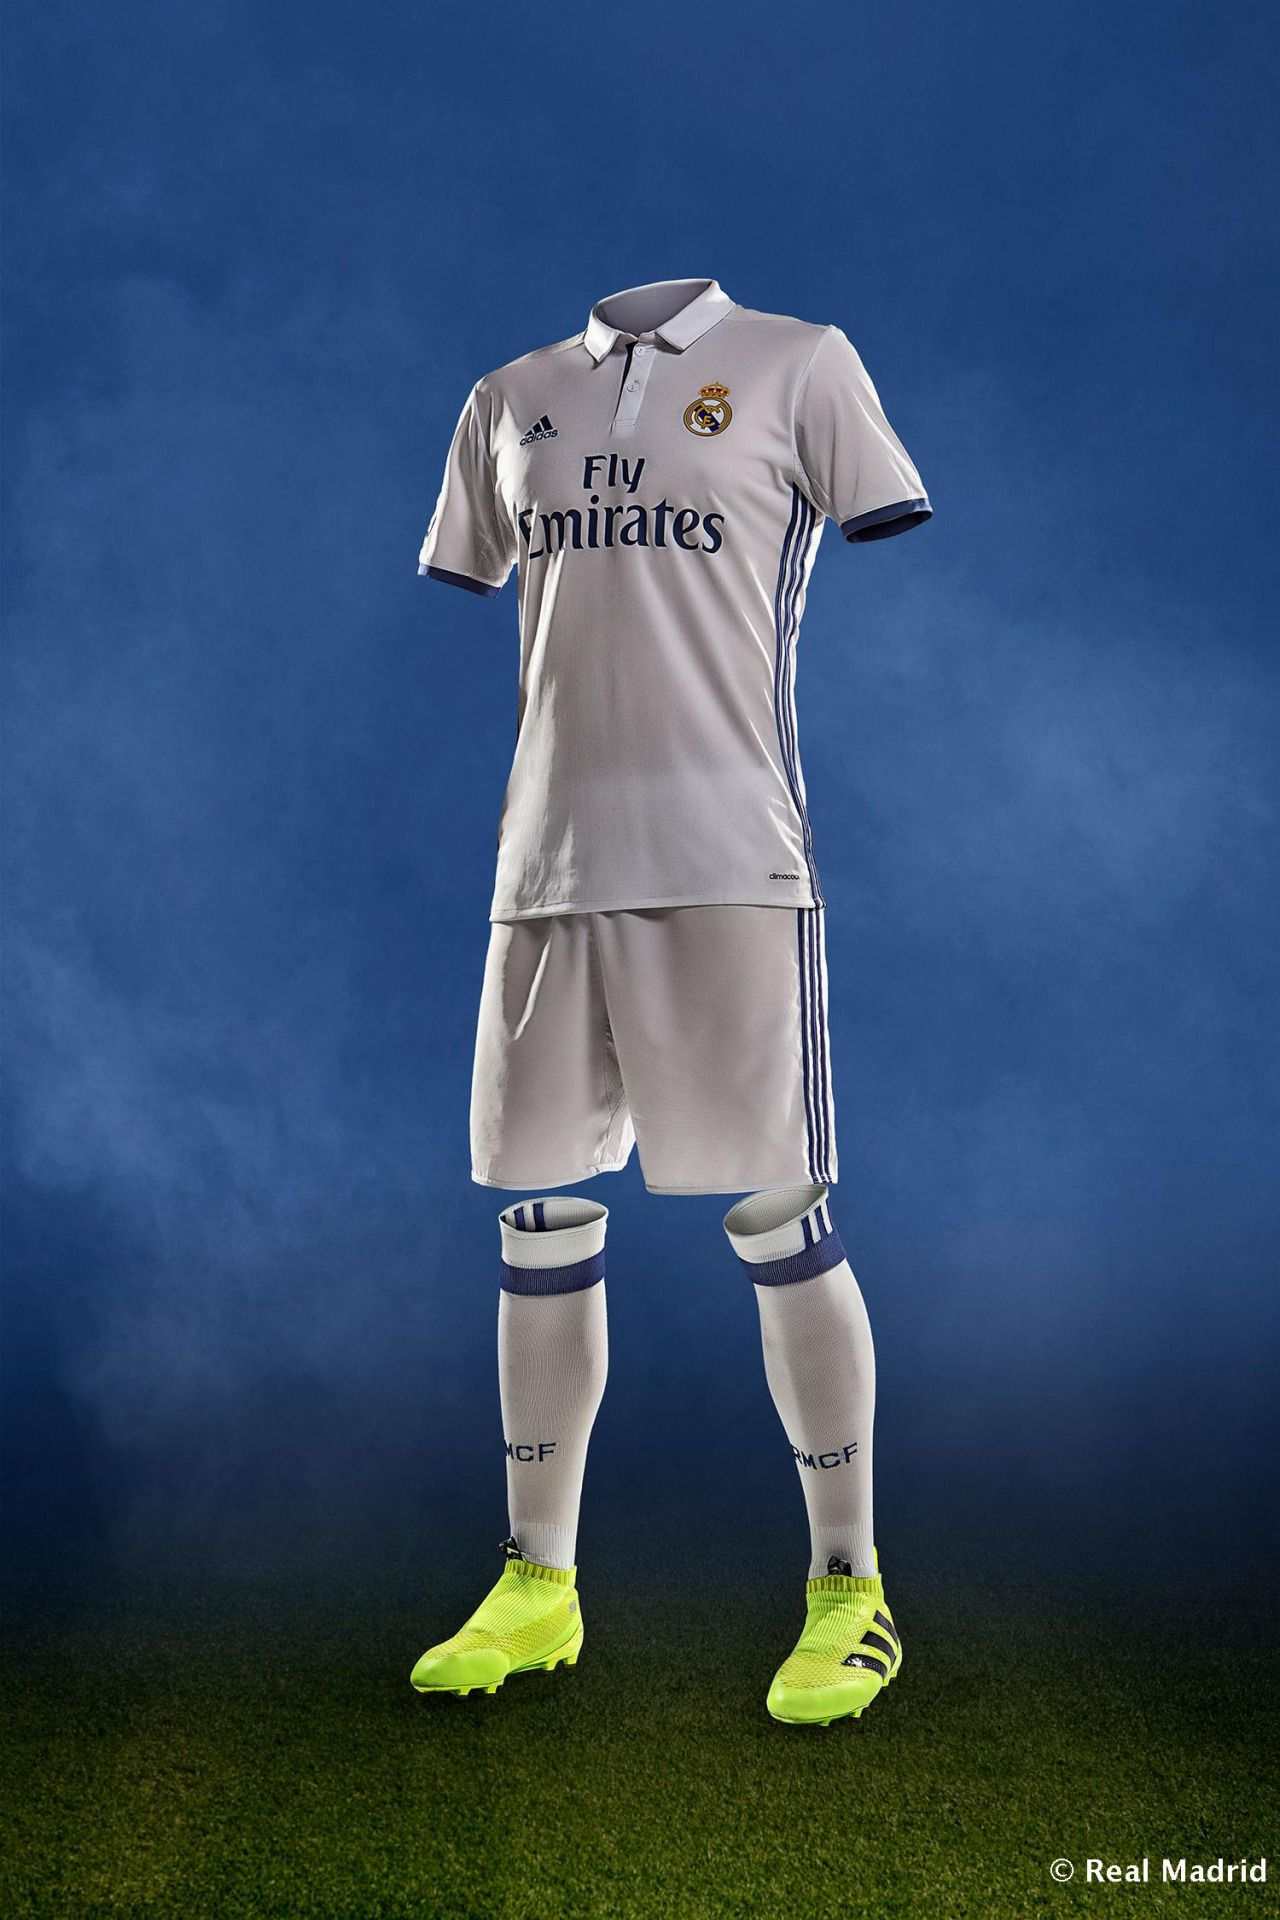 Guti14haz Real Madrid Kit Real Madrid Real Madrid Football